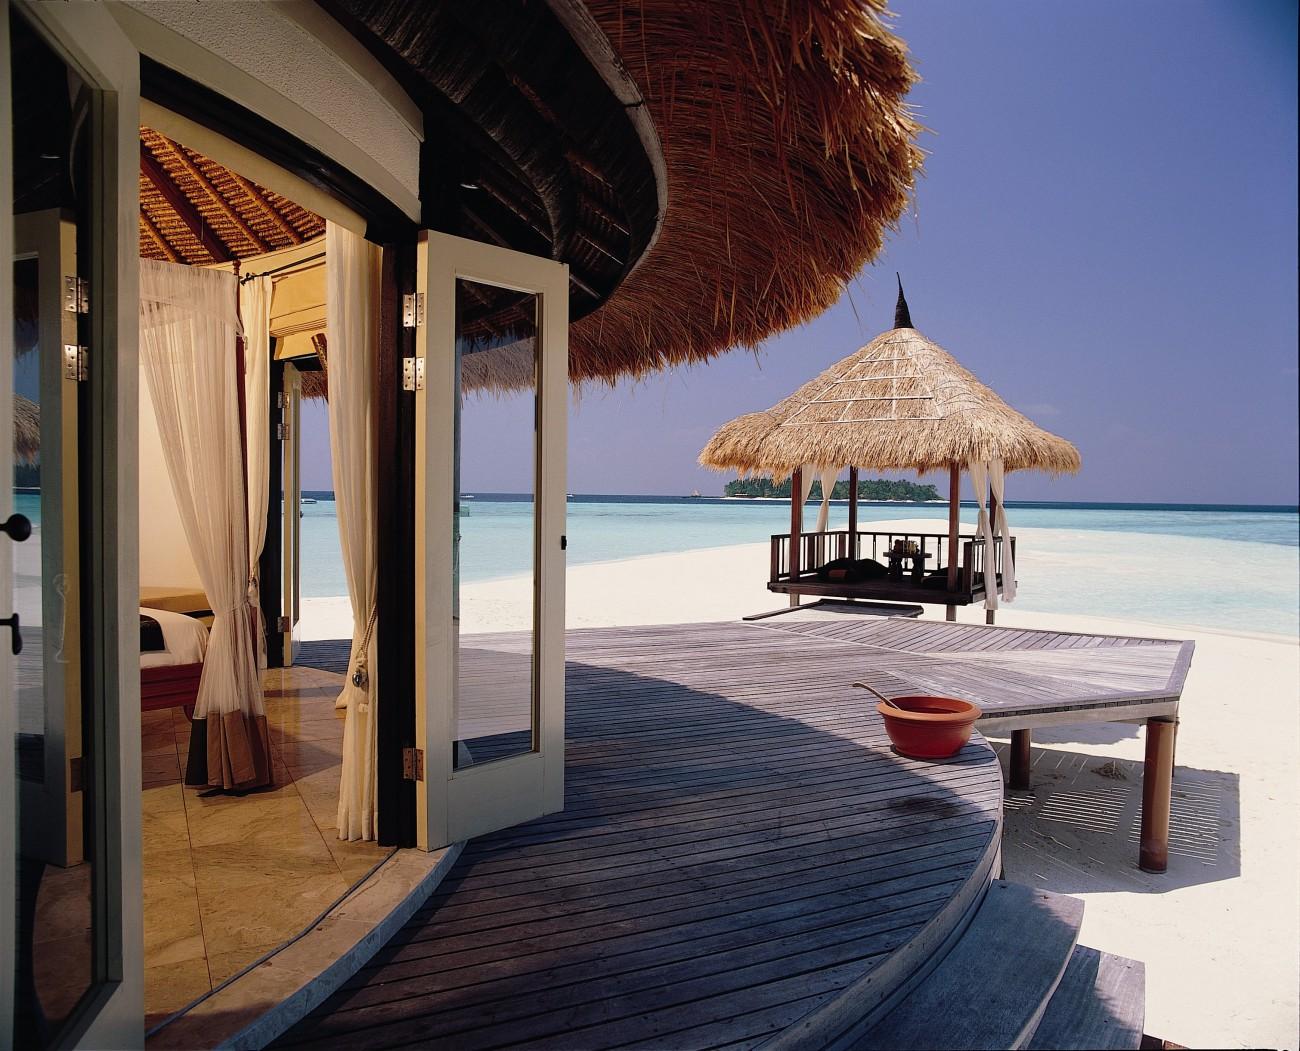 Banyan Tree BeachFront pool Villa